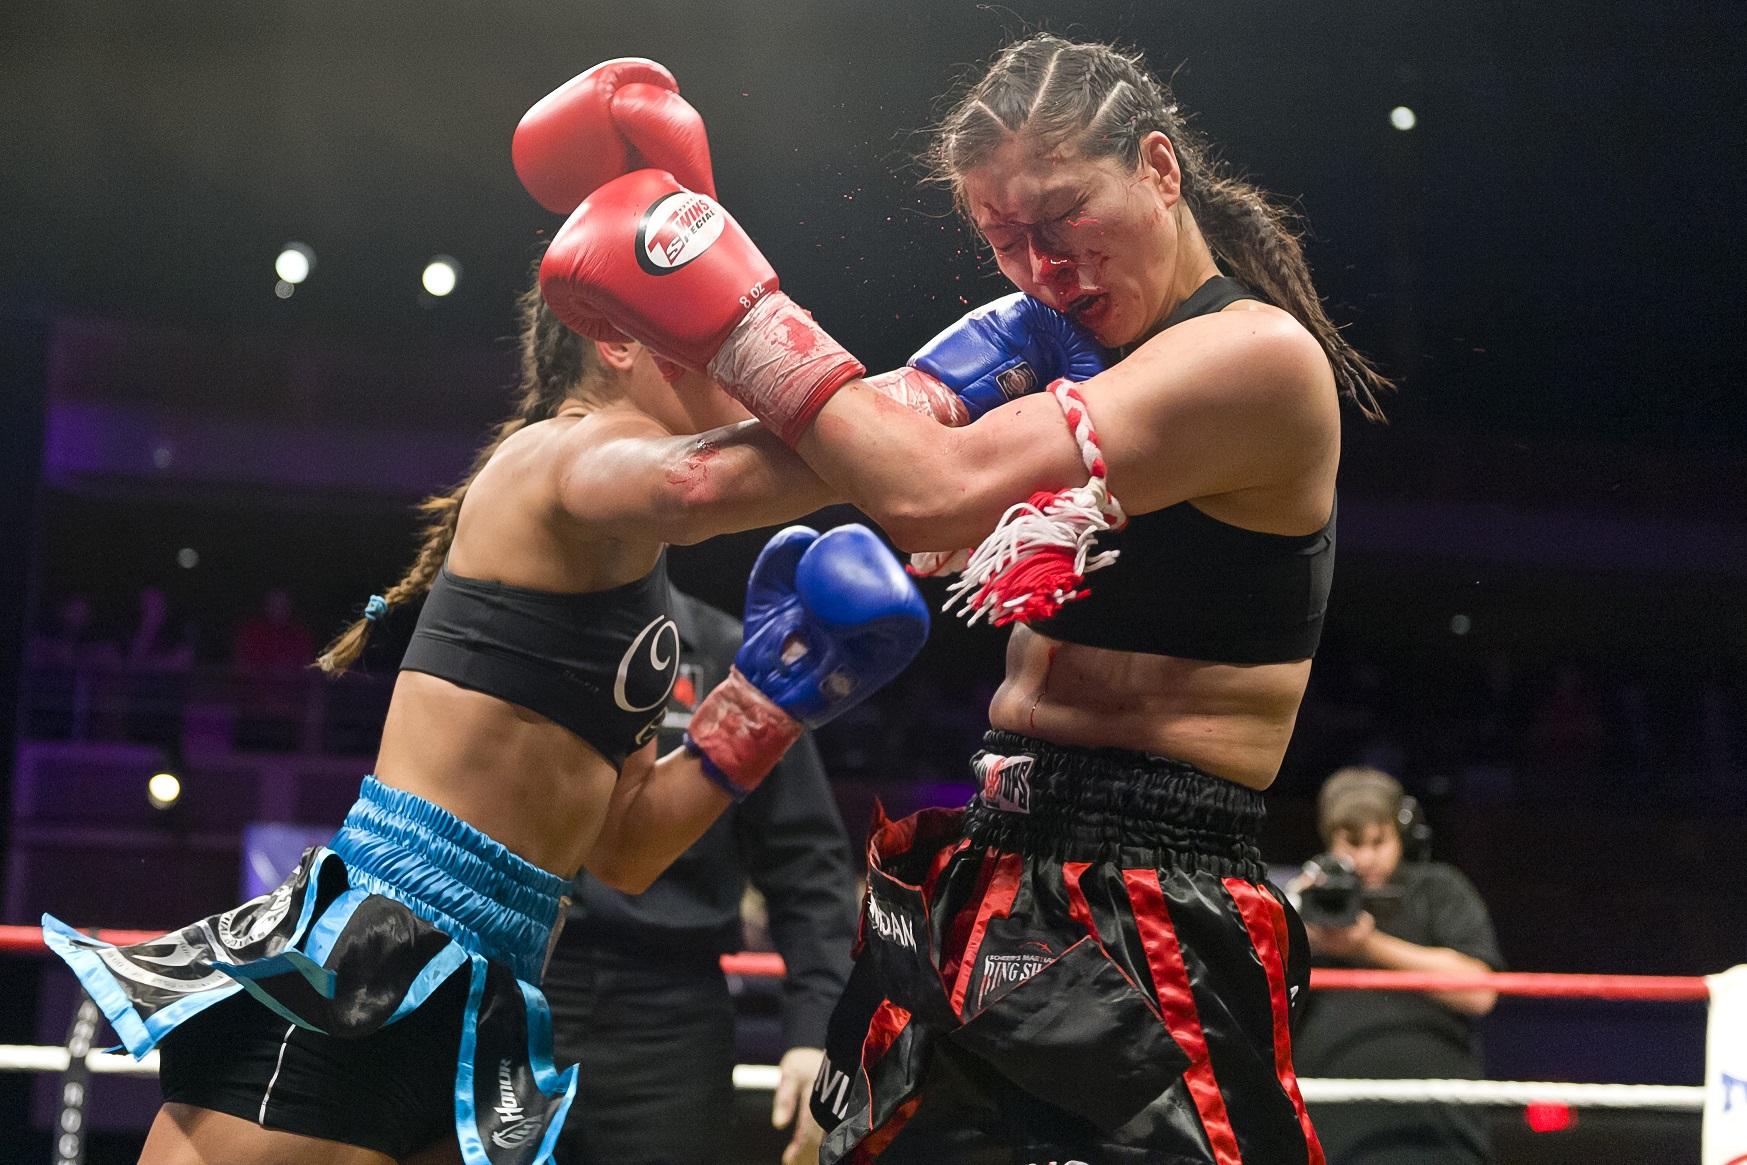 Tiffany Van Soest (Left) vs. Vivian Leung.  Photo by Ray Kasprowicz.